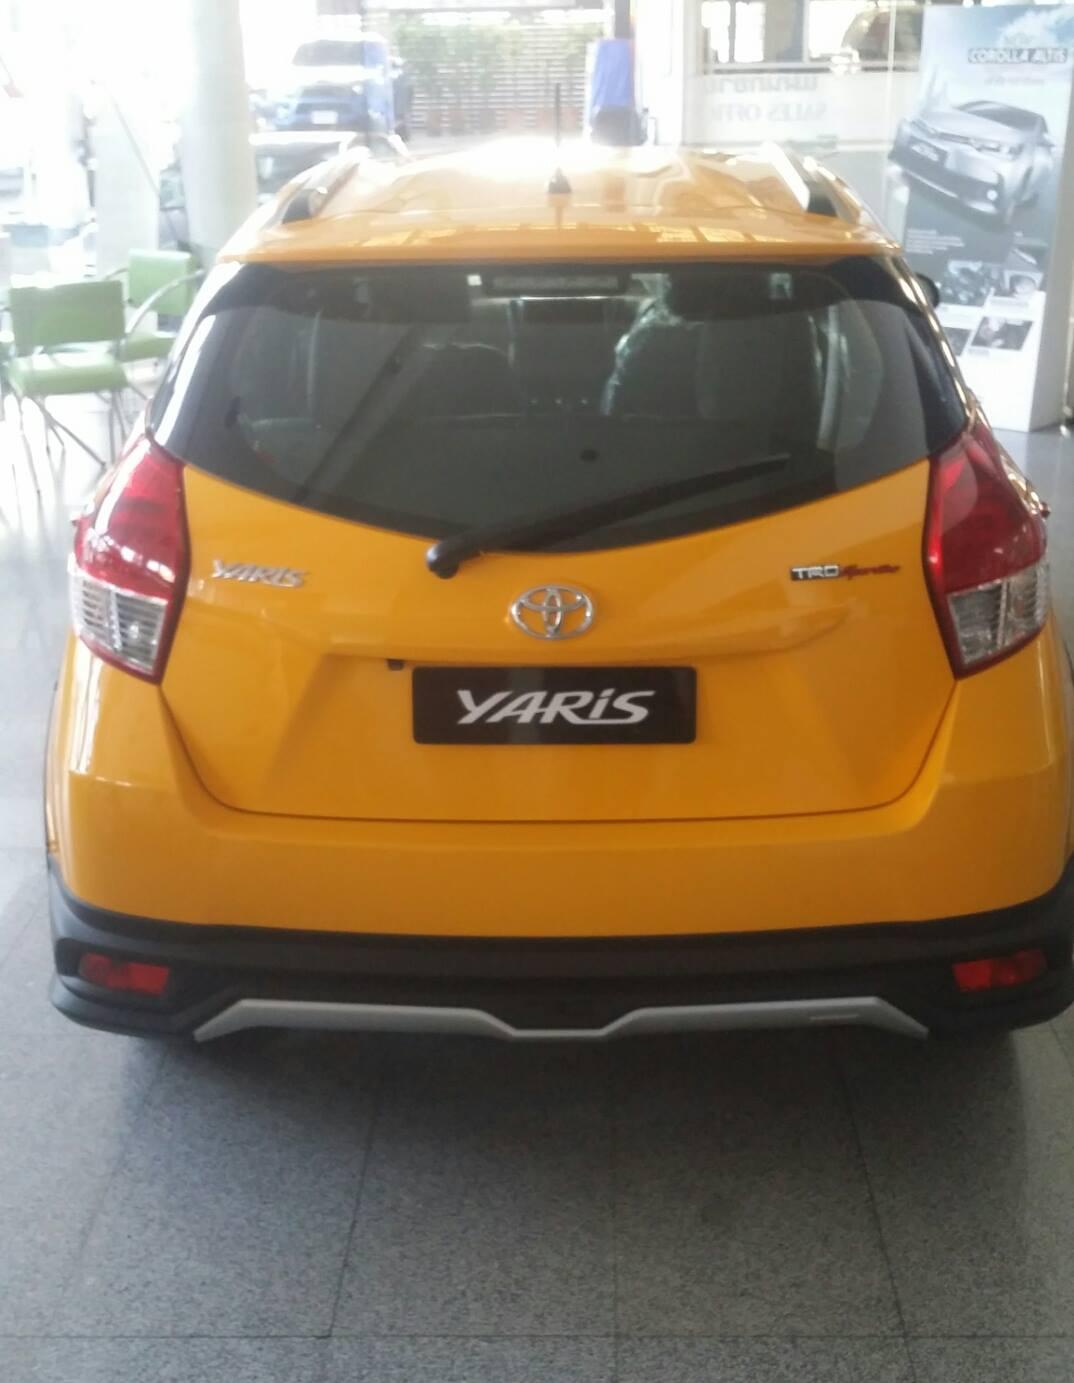 Toyota Yaris Trd Sportivo Olx Spesifikasi Oli Grand New Avanza ออกรถใหม Toyotaโตโยตาปายแดงทกรน วออส ยารส อลตส